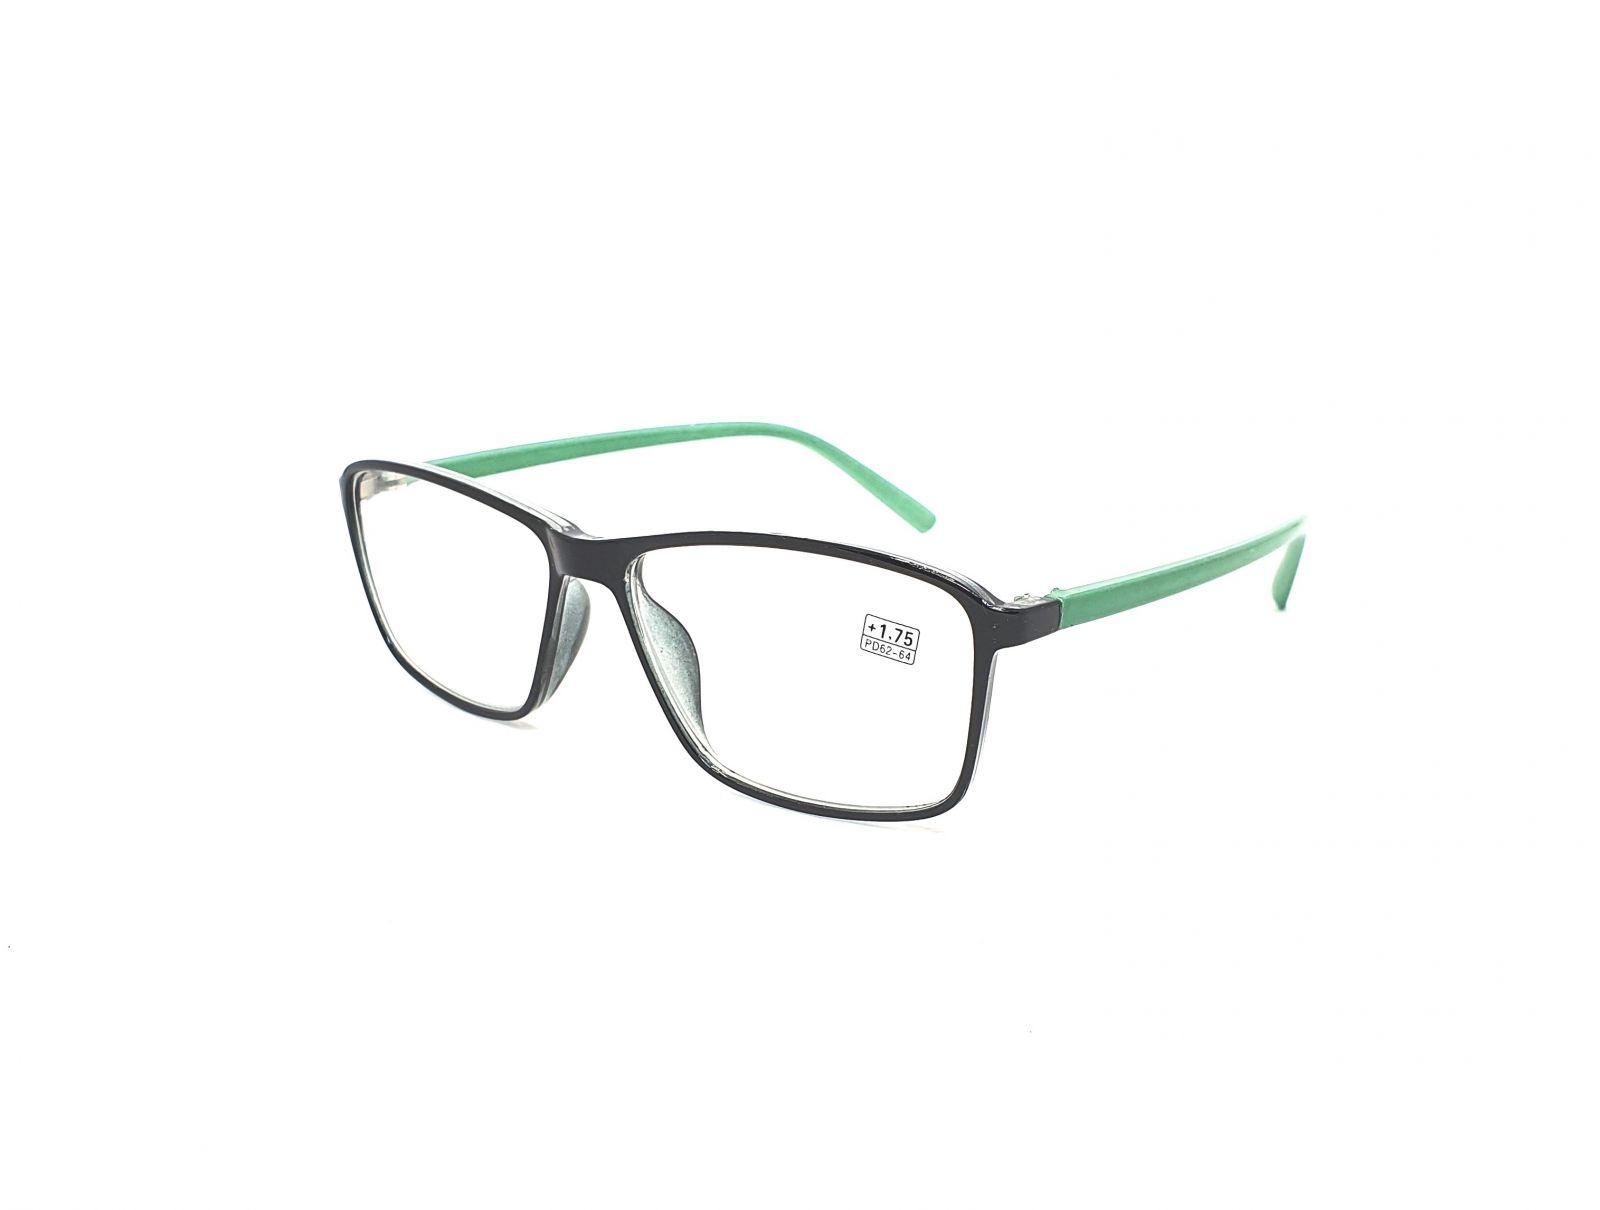 Dioptrické brýle 17218 / +2,00 green